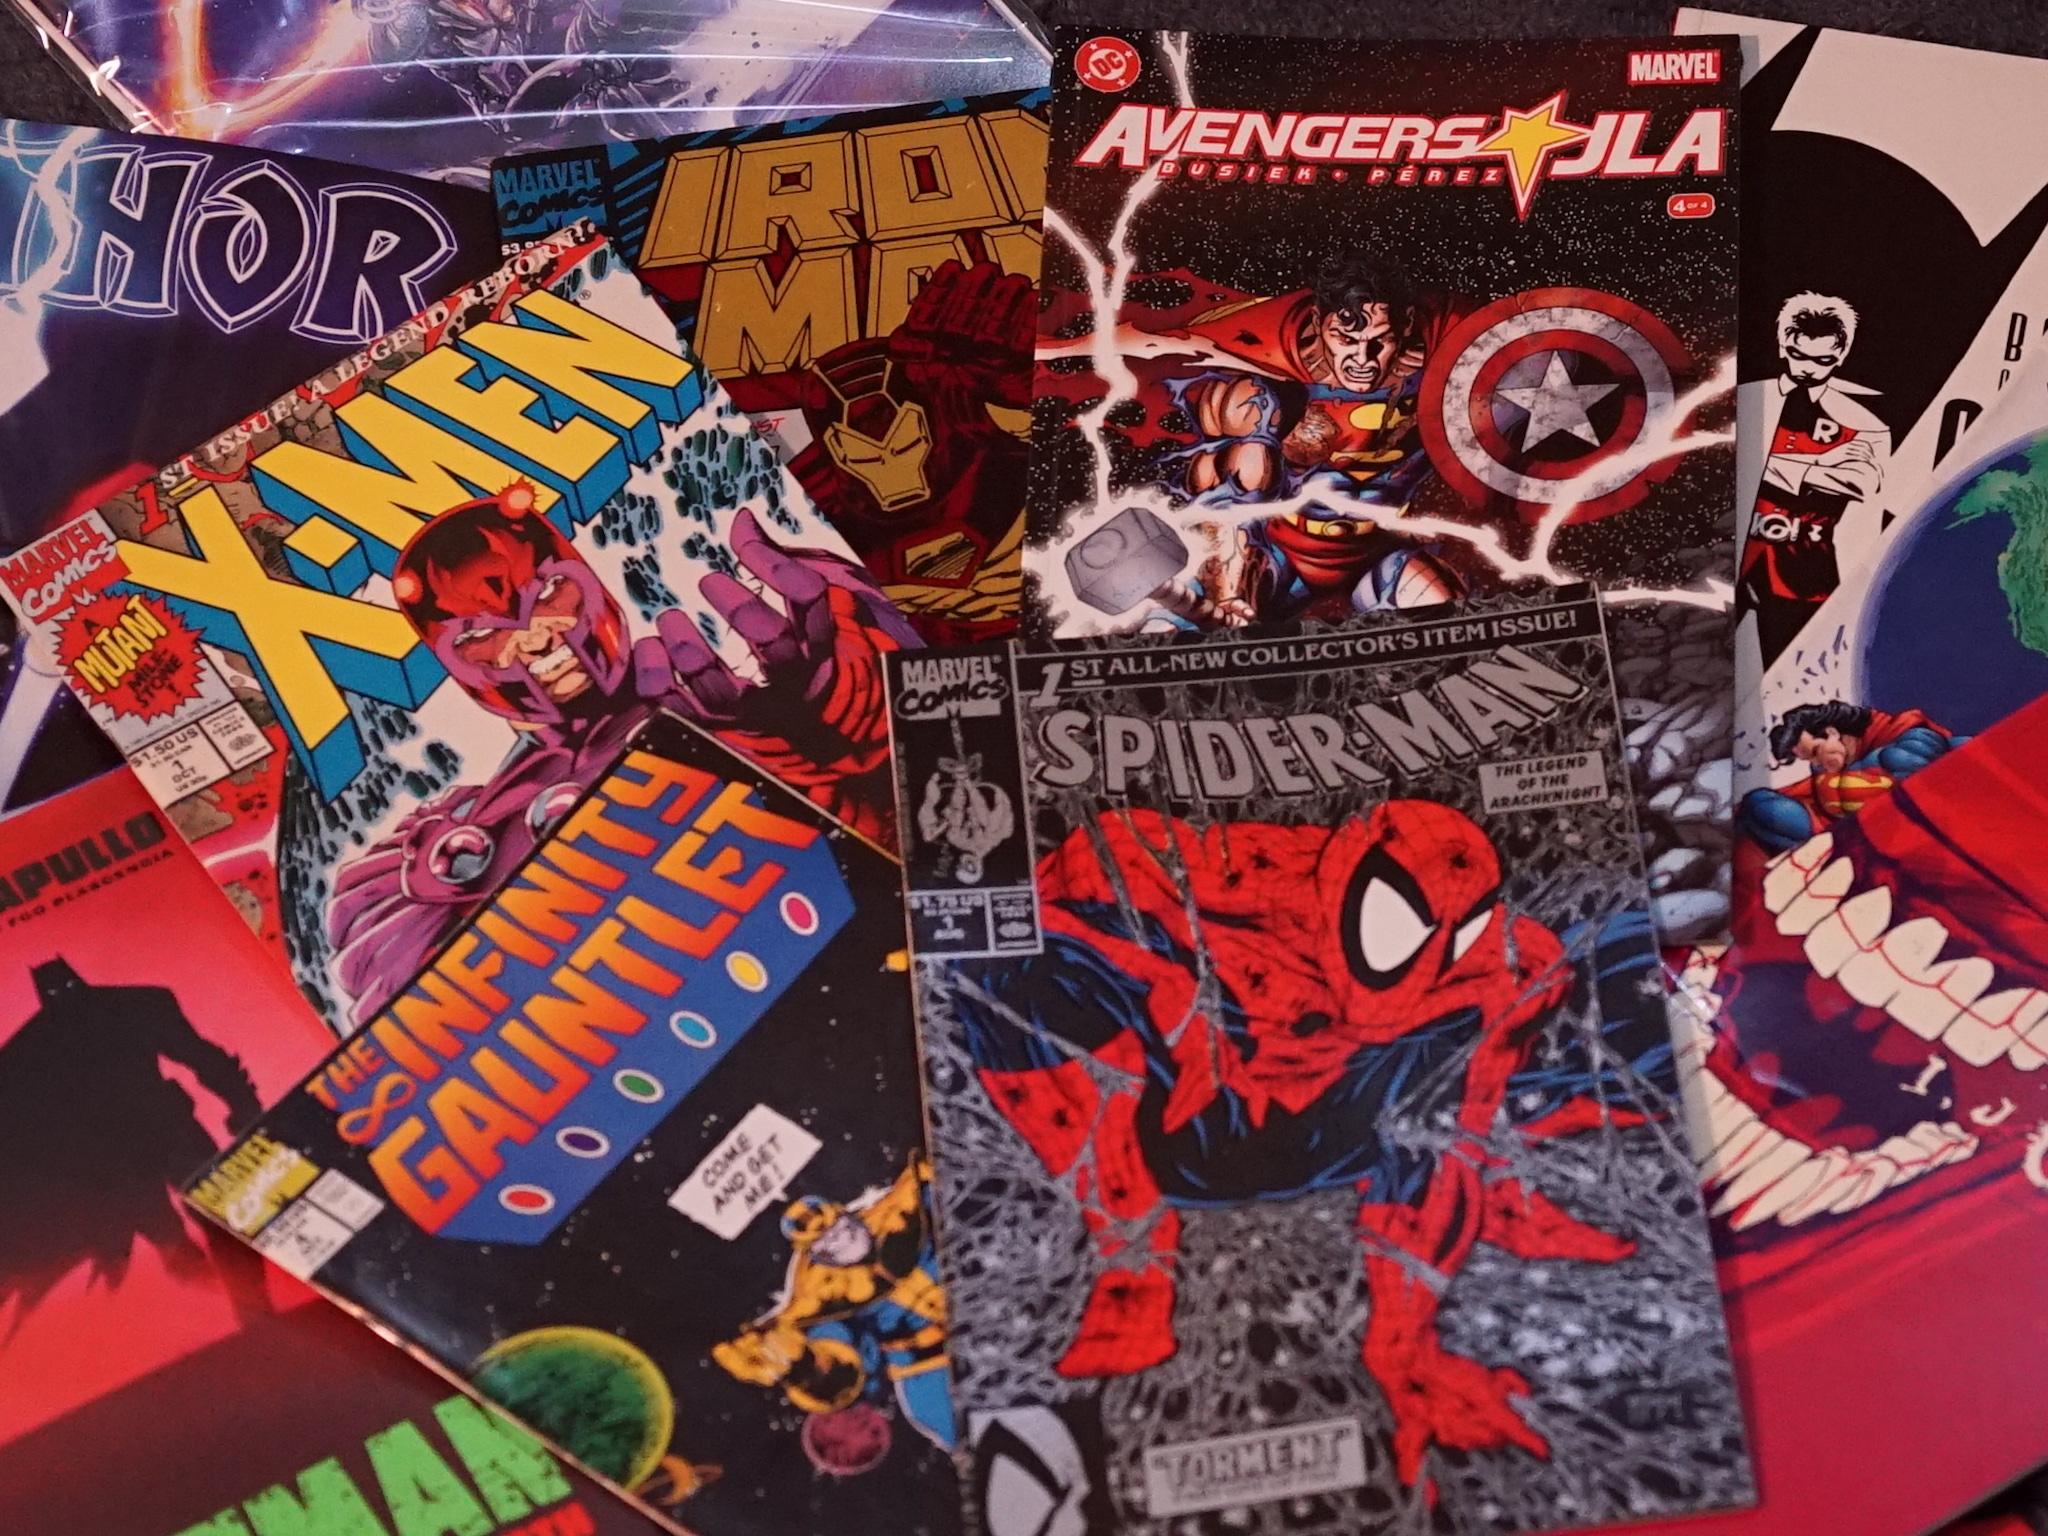 Comics, comic books, x-men, spider-man, avengers, iron-man, batman, superman